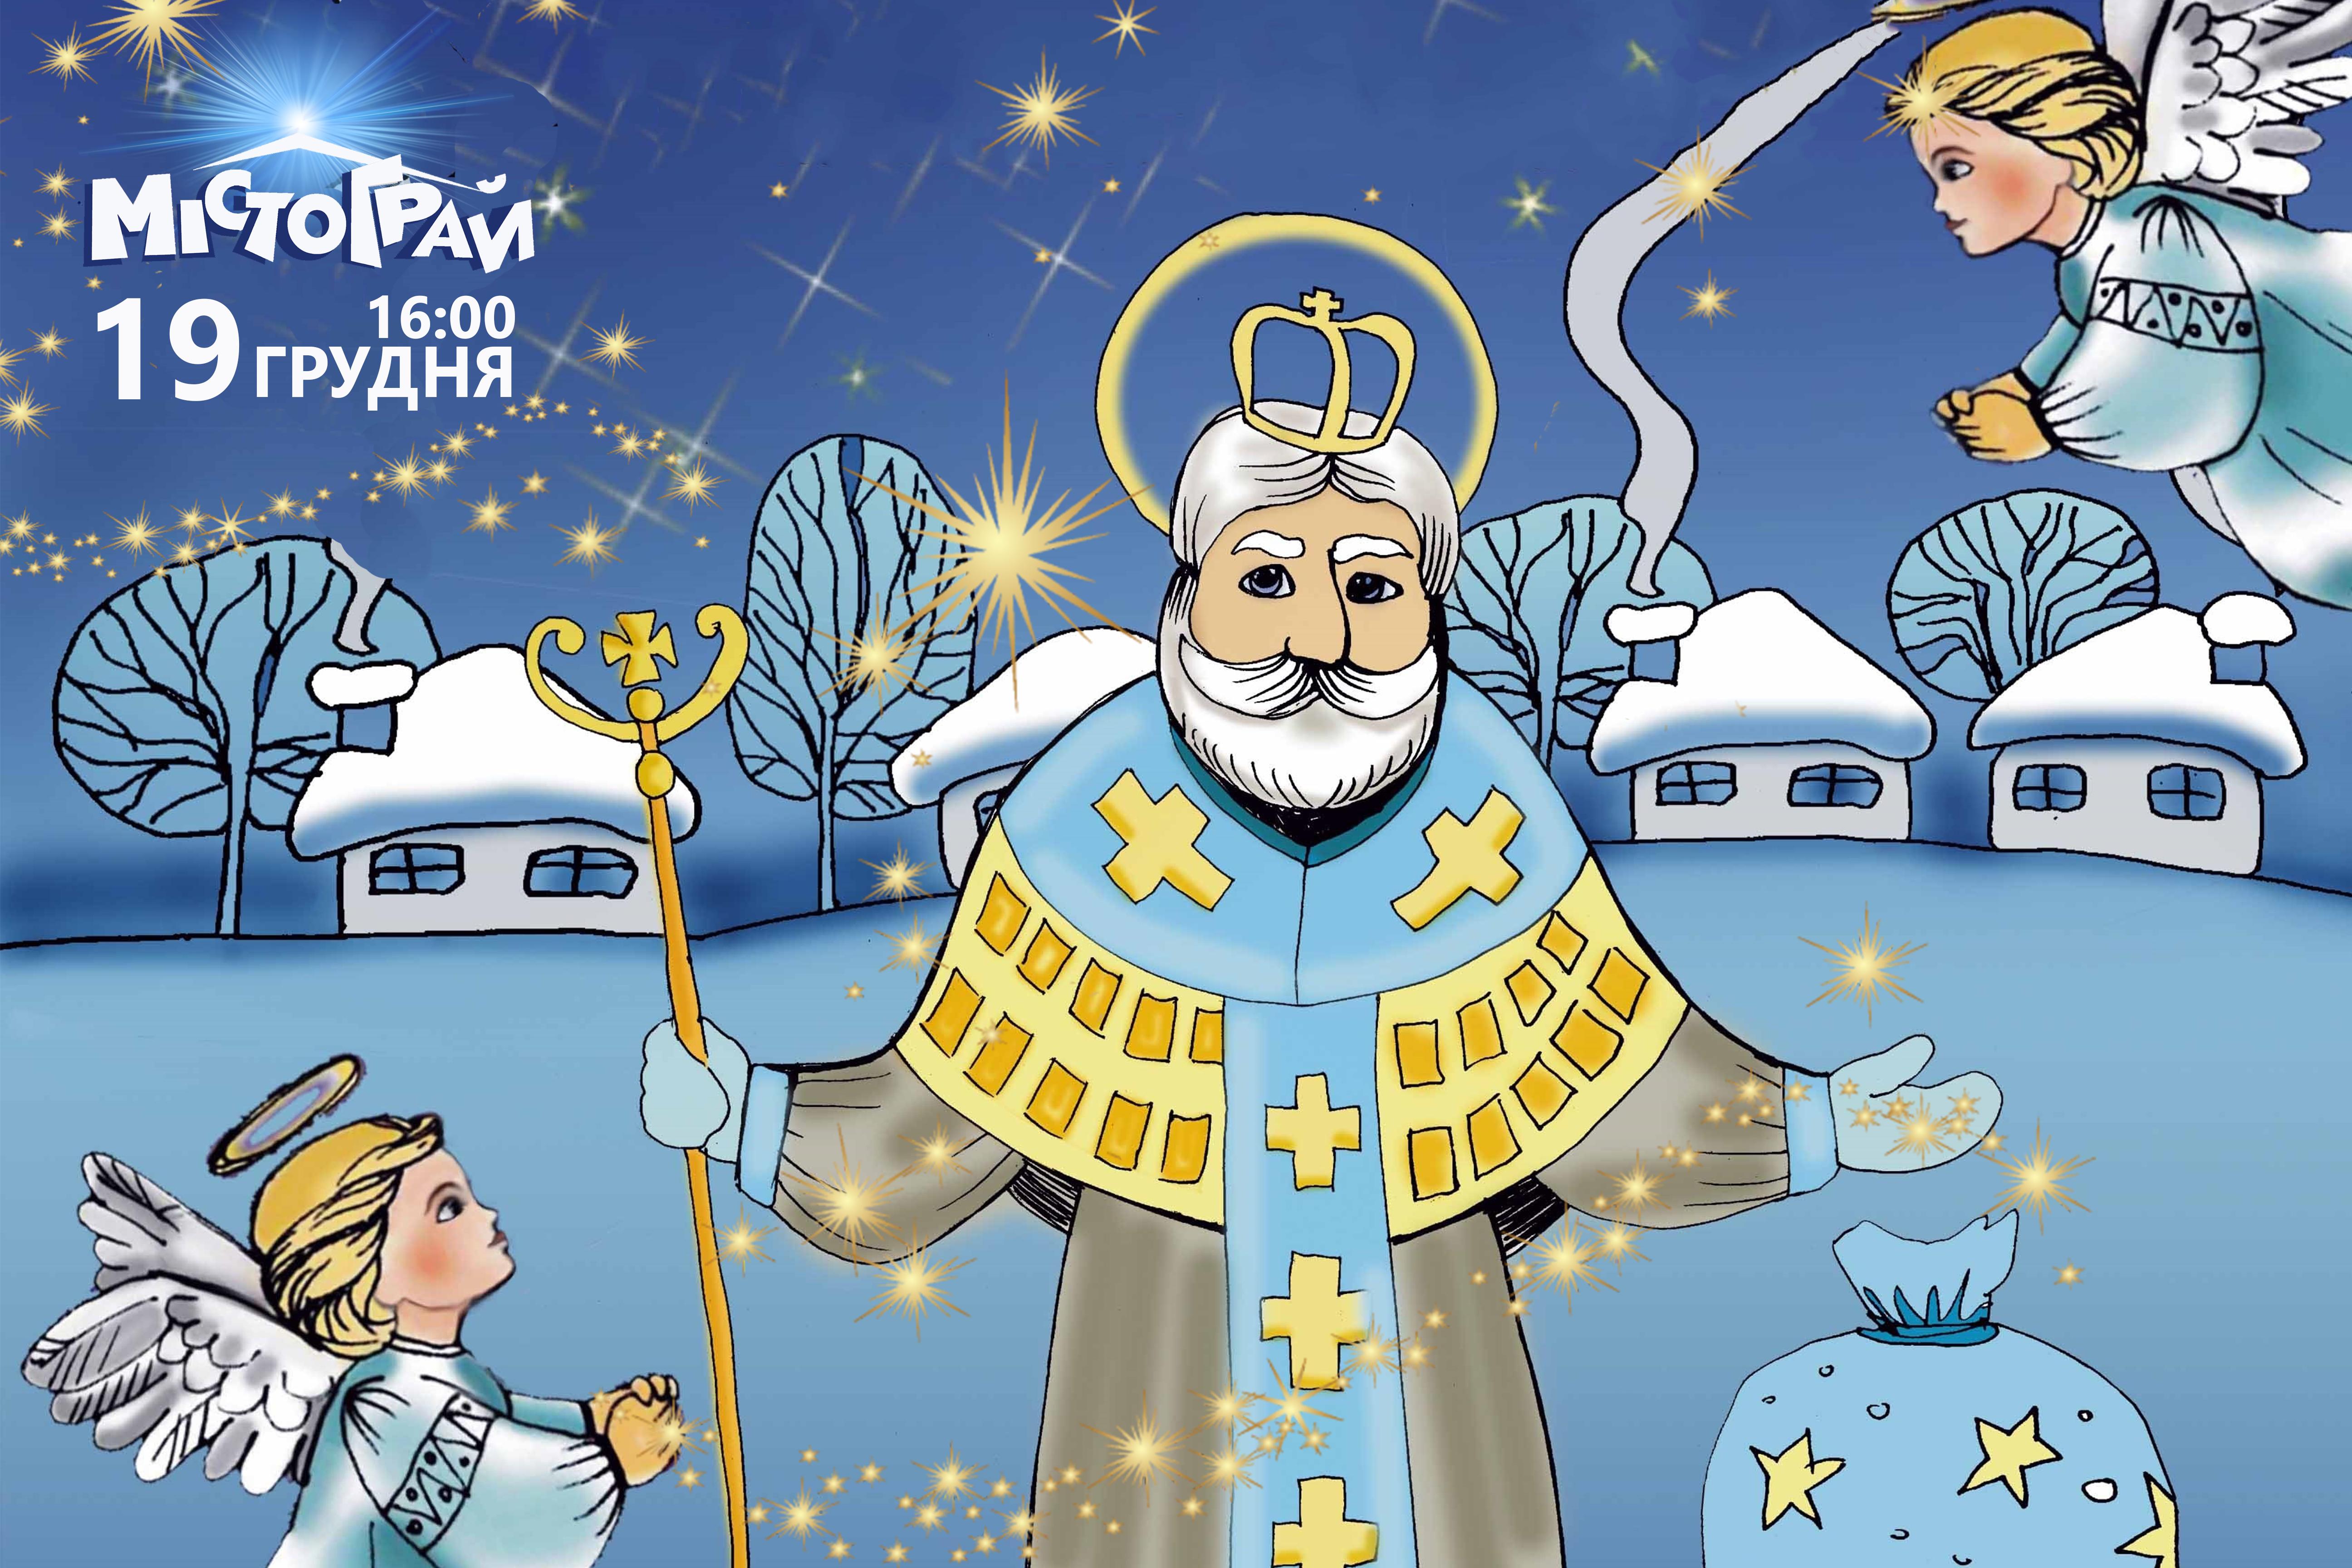 Запрошуємо на День Святого Миколая!